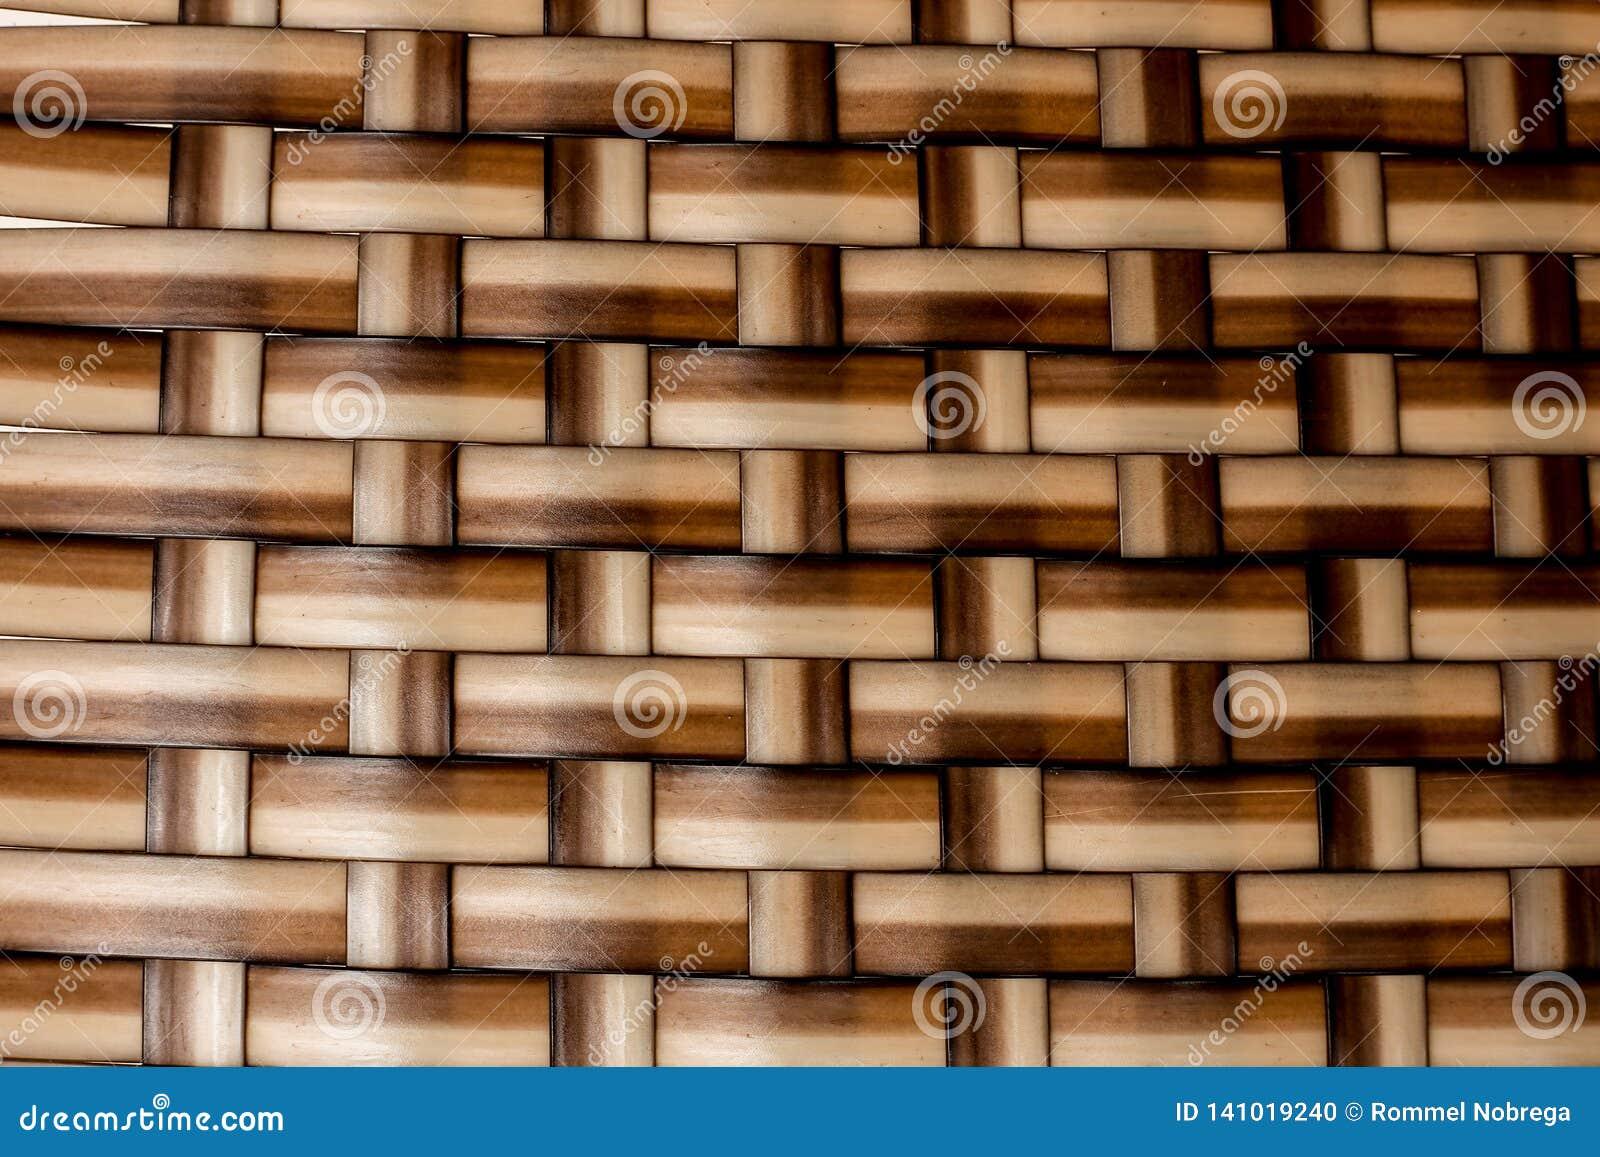 braided straw texture